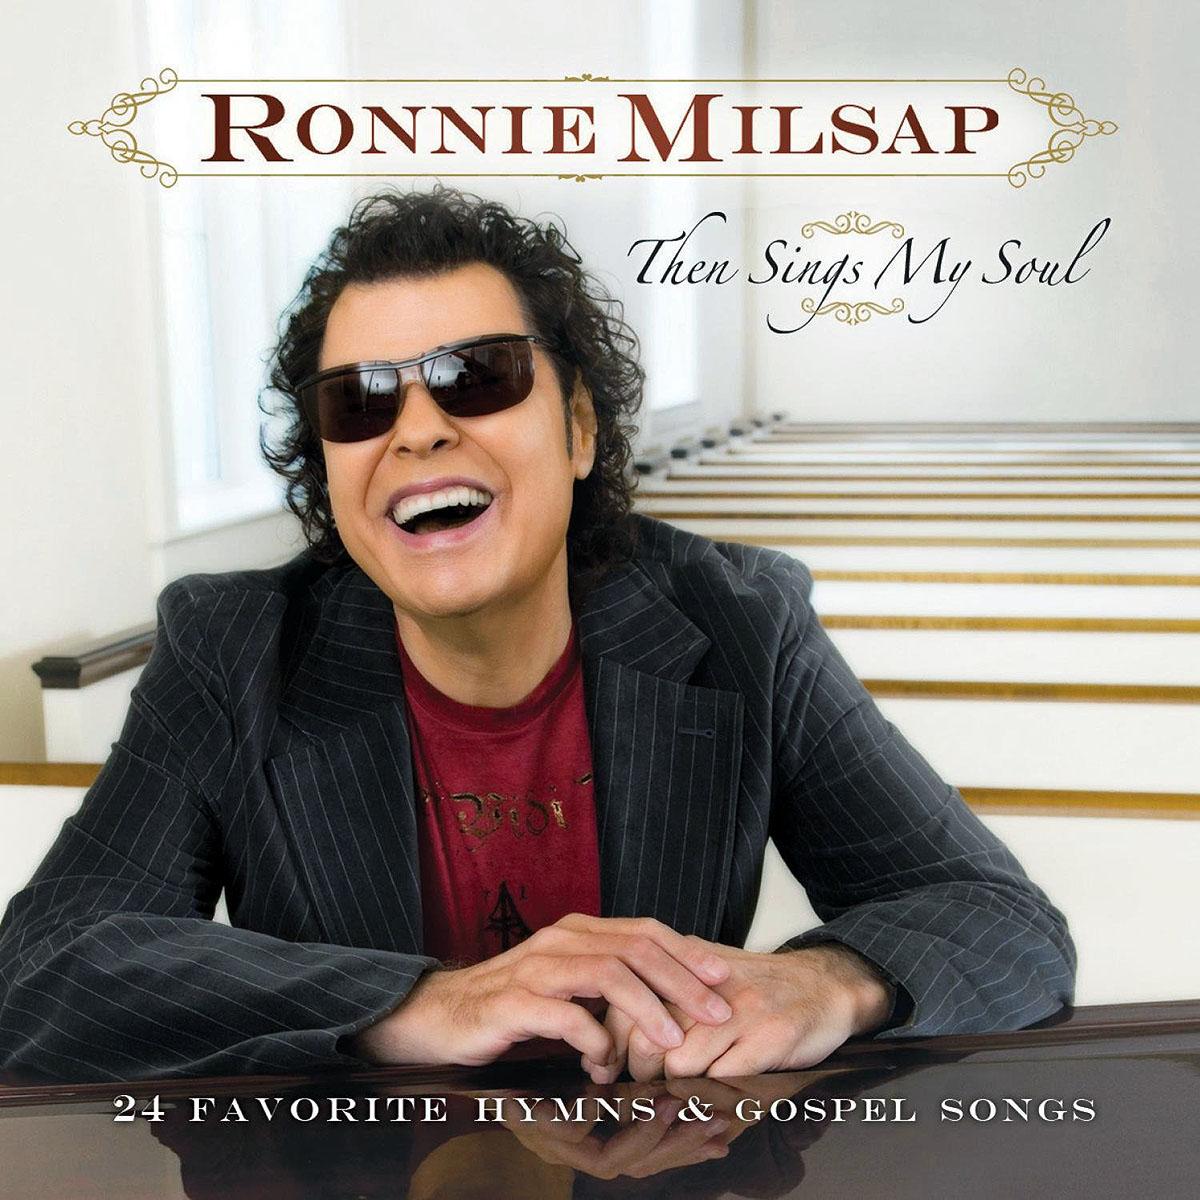 Ronnie Milsap Then Sings My Soul